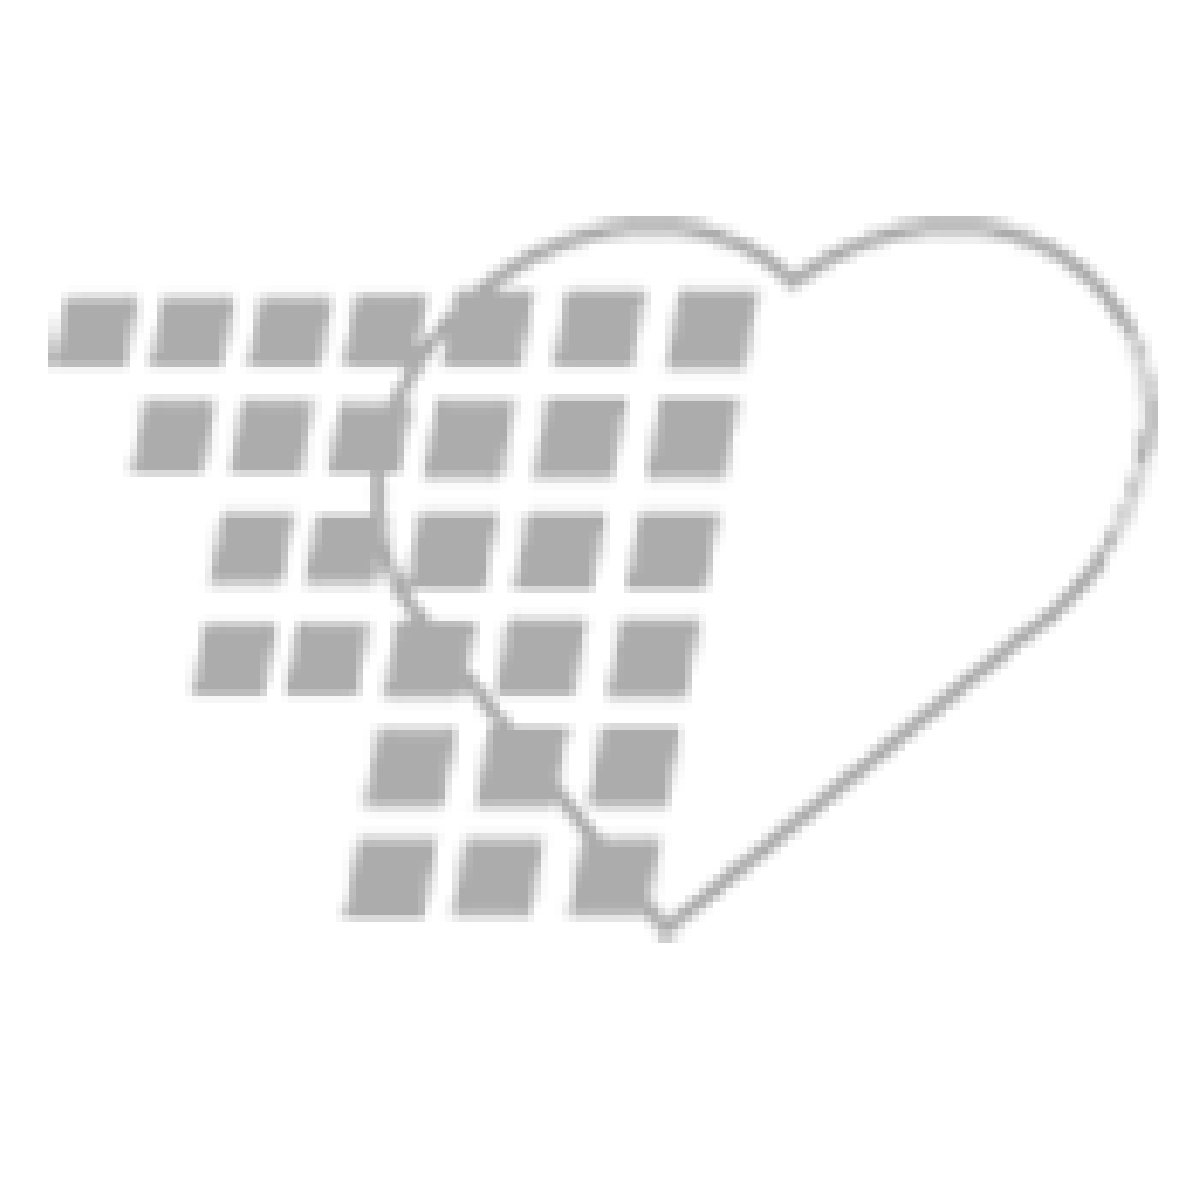 06-93-0309 - Demo Dose® Long Term Dyazid 37.5 mg/25 mg Medication Pack